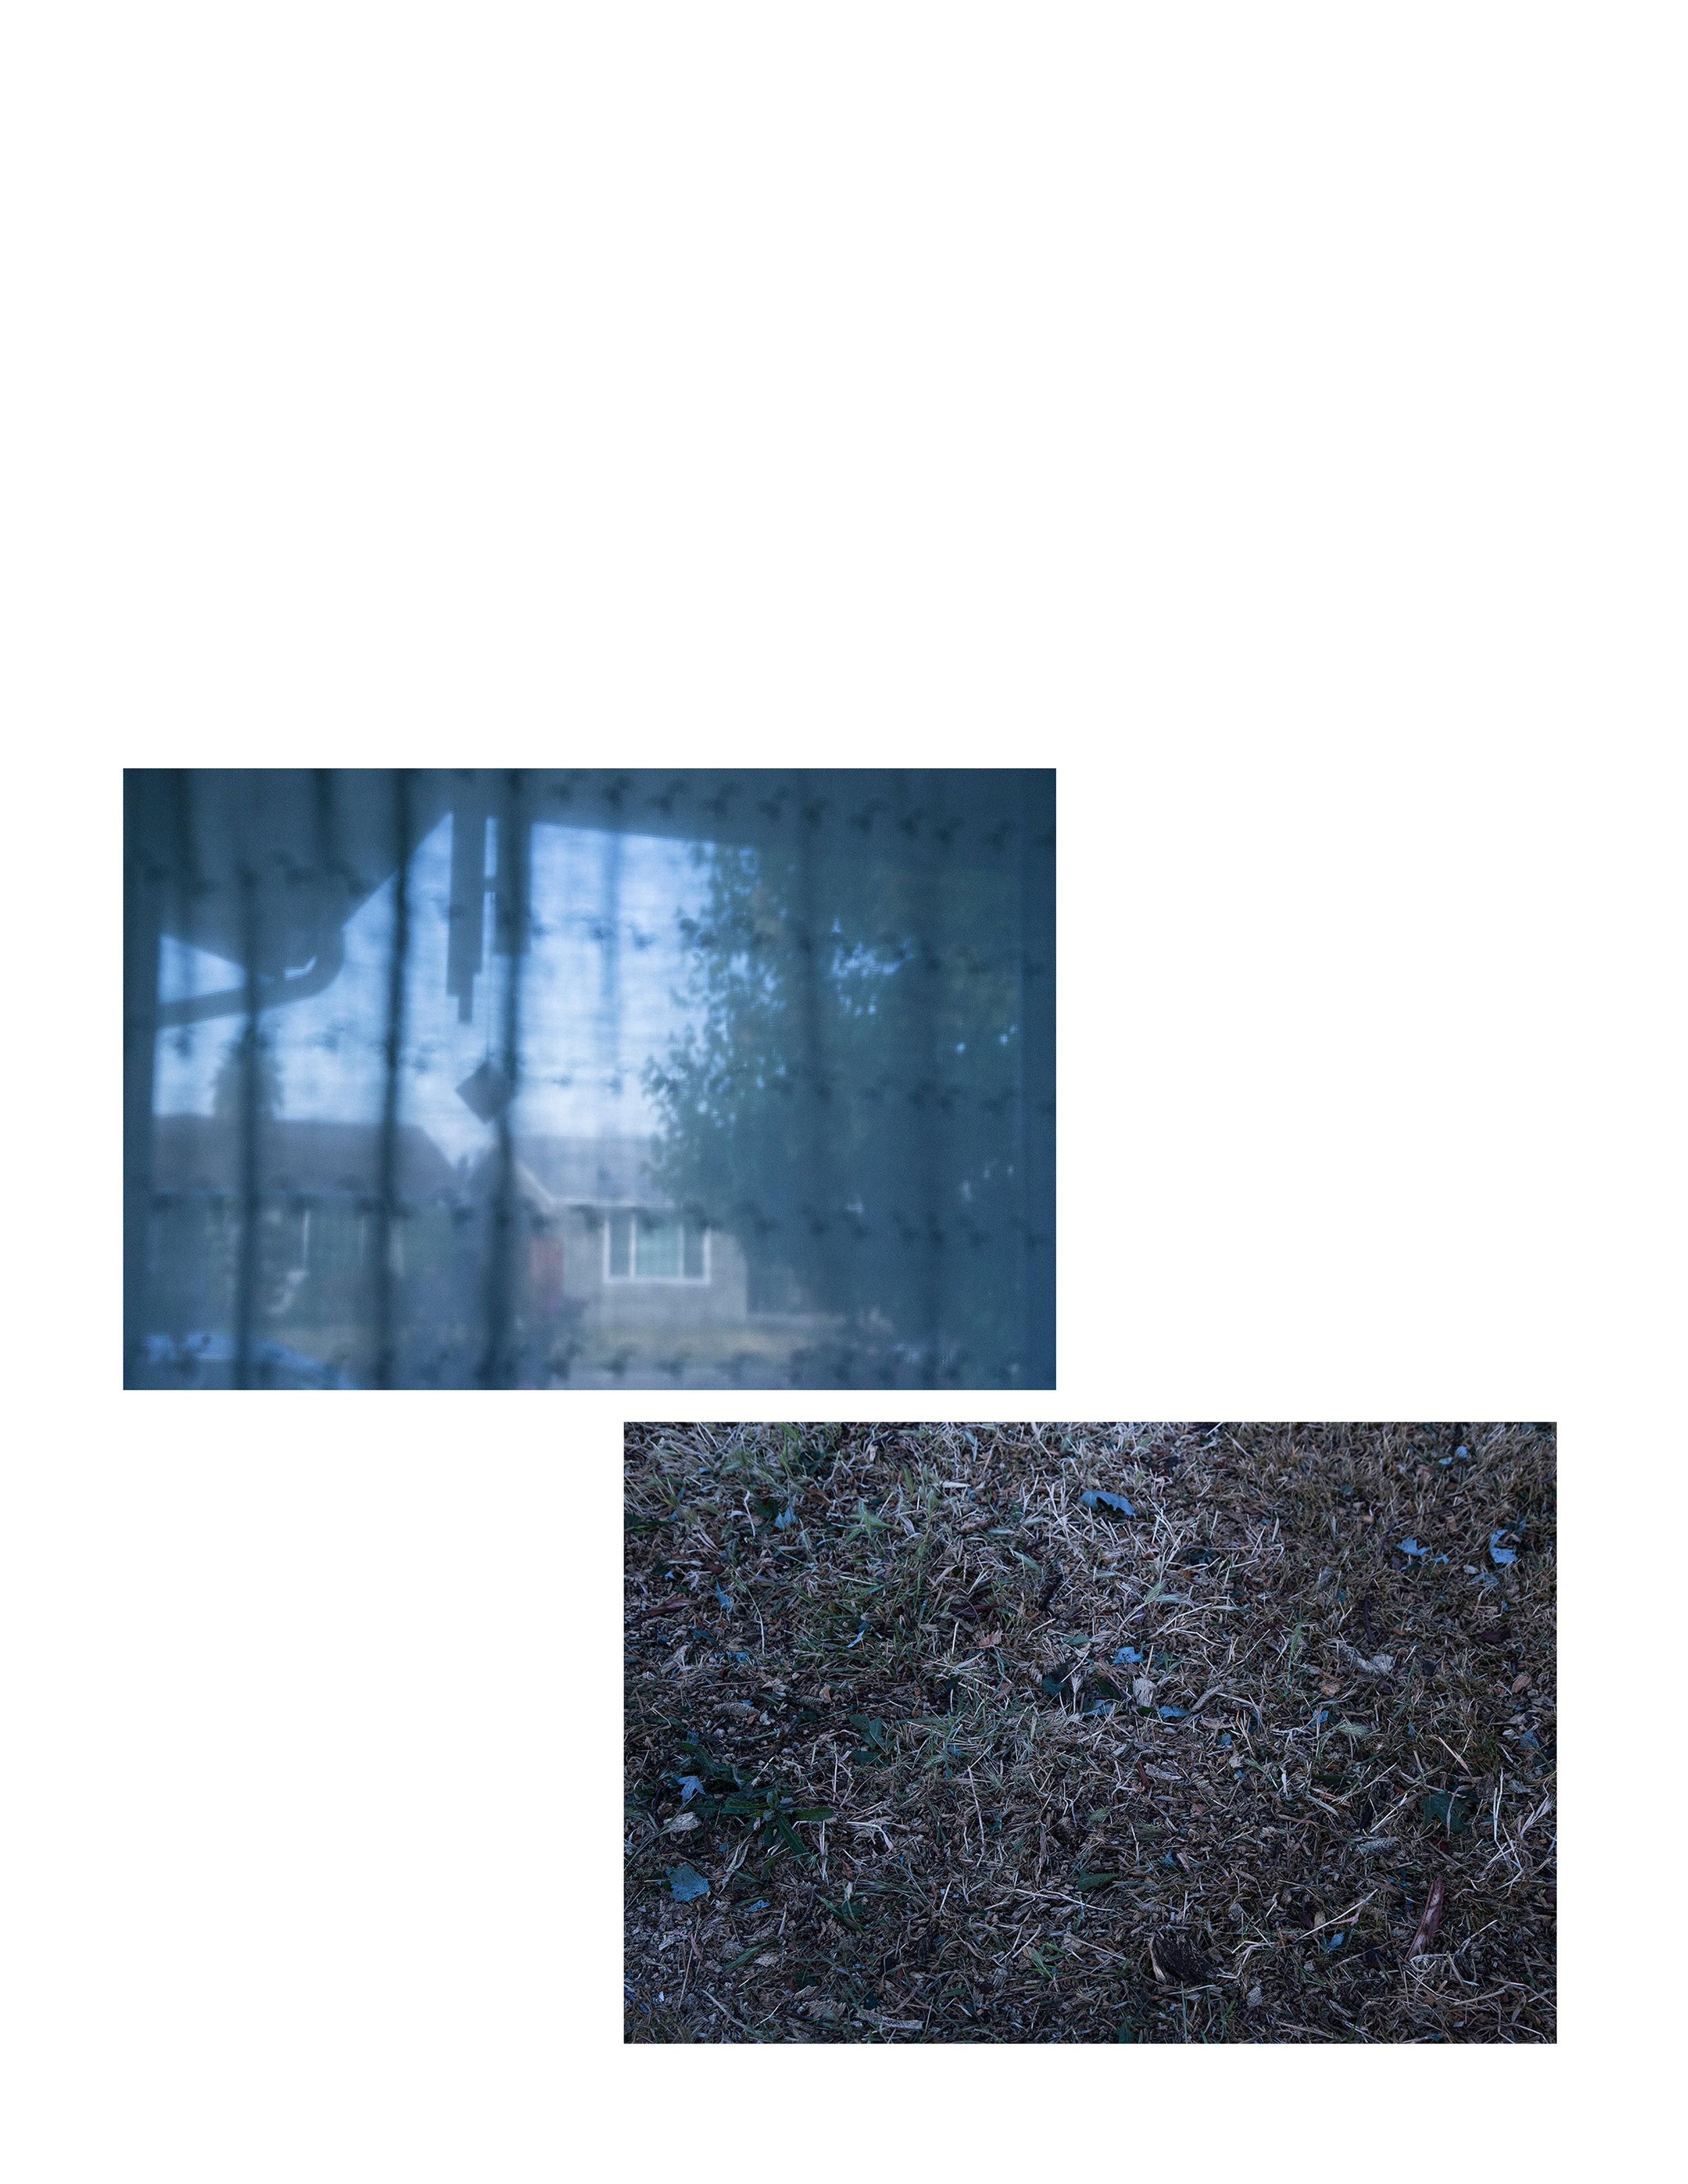 p35.jpg